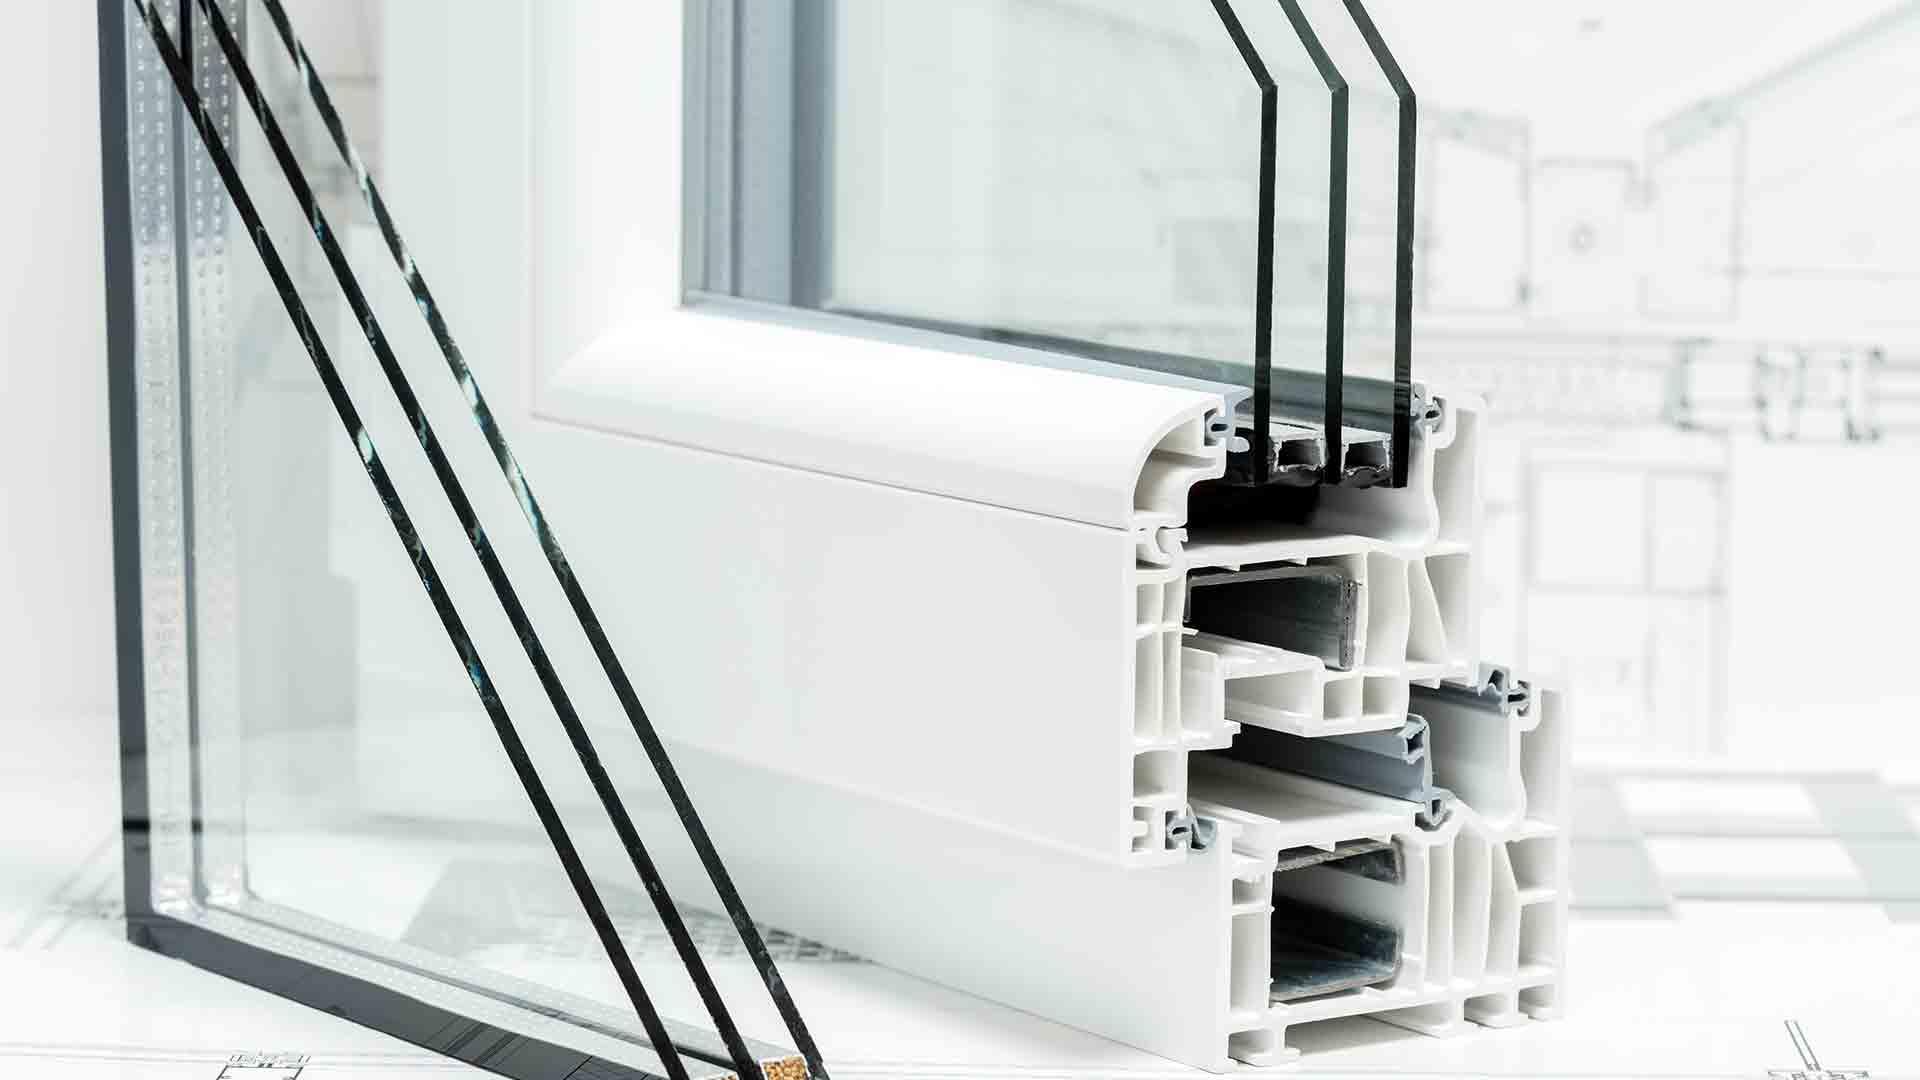 triple pane window segments in vinyl siding